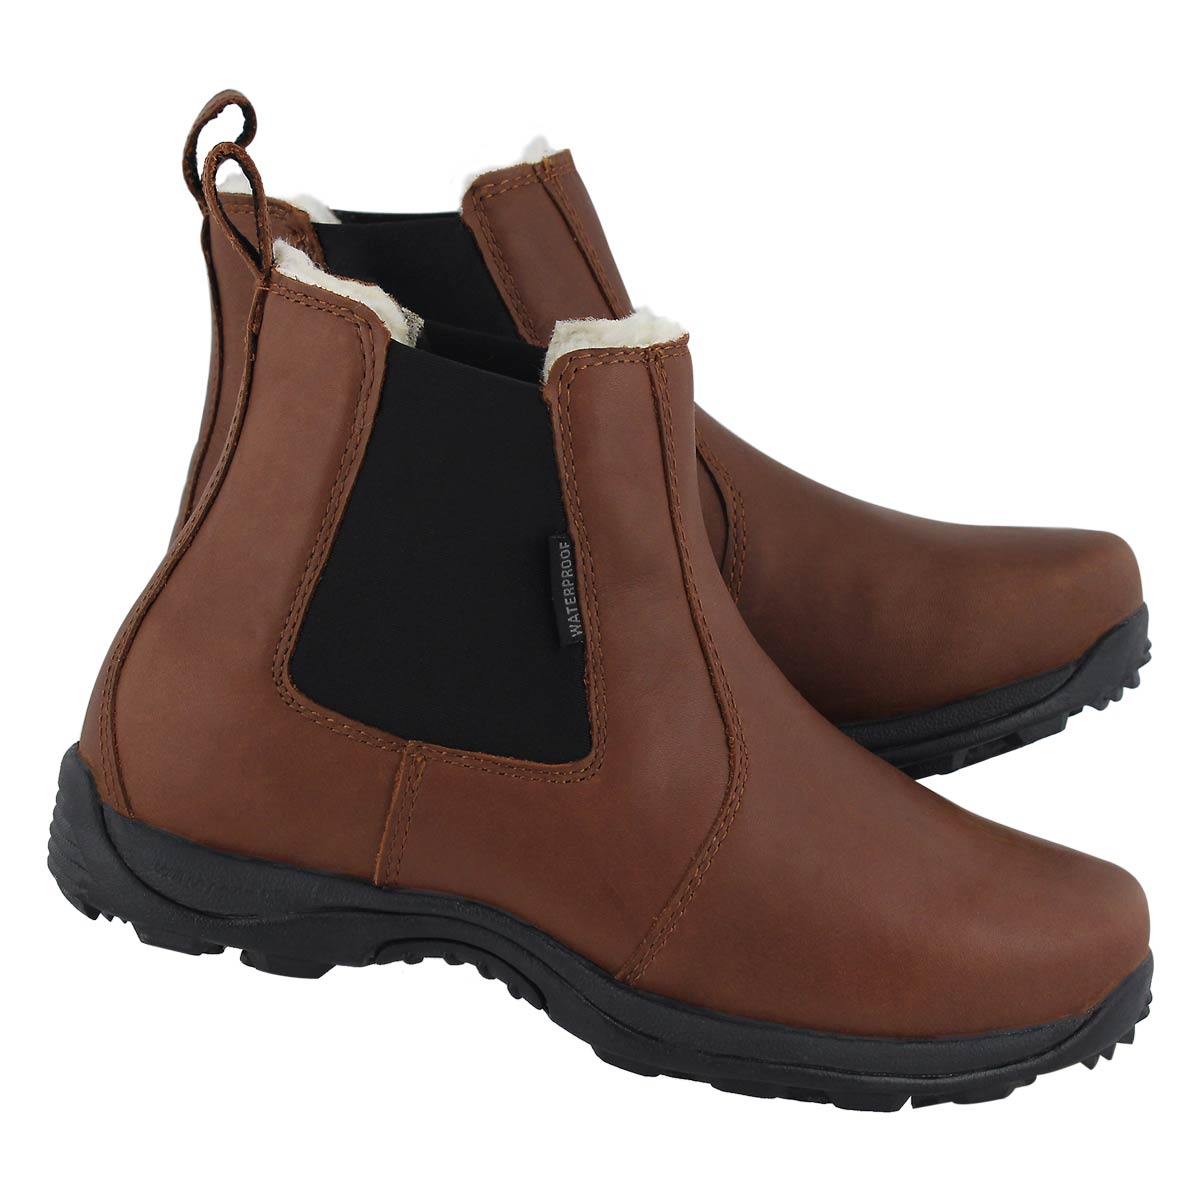 b7b74e5738c Women   Winter Boots   SoftMoc.com bard